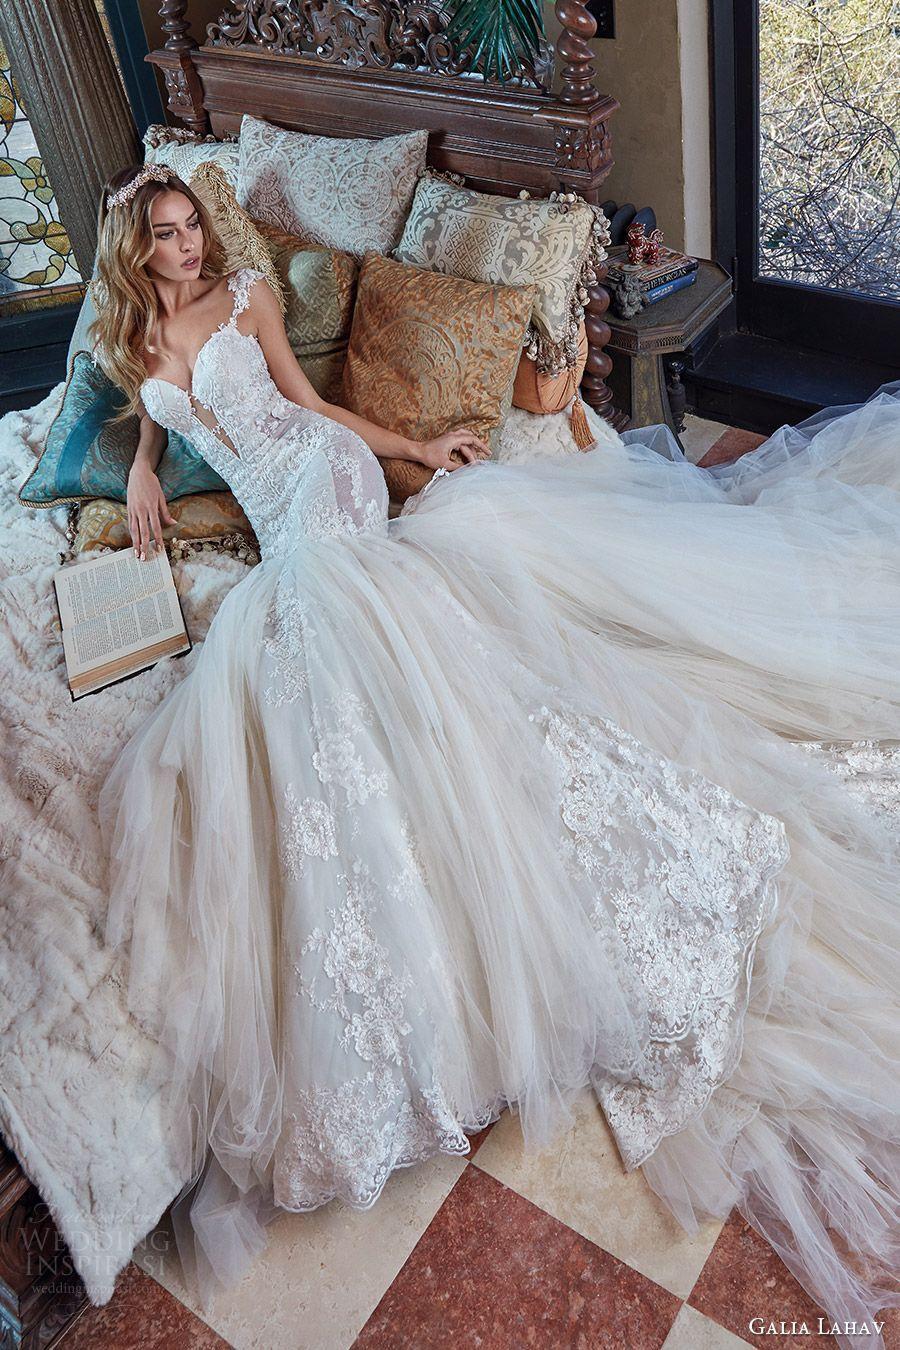 Galia lahav bridal spring cap sleeves split sweetheart lace